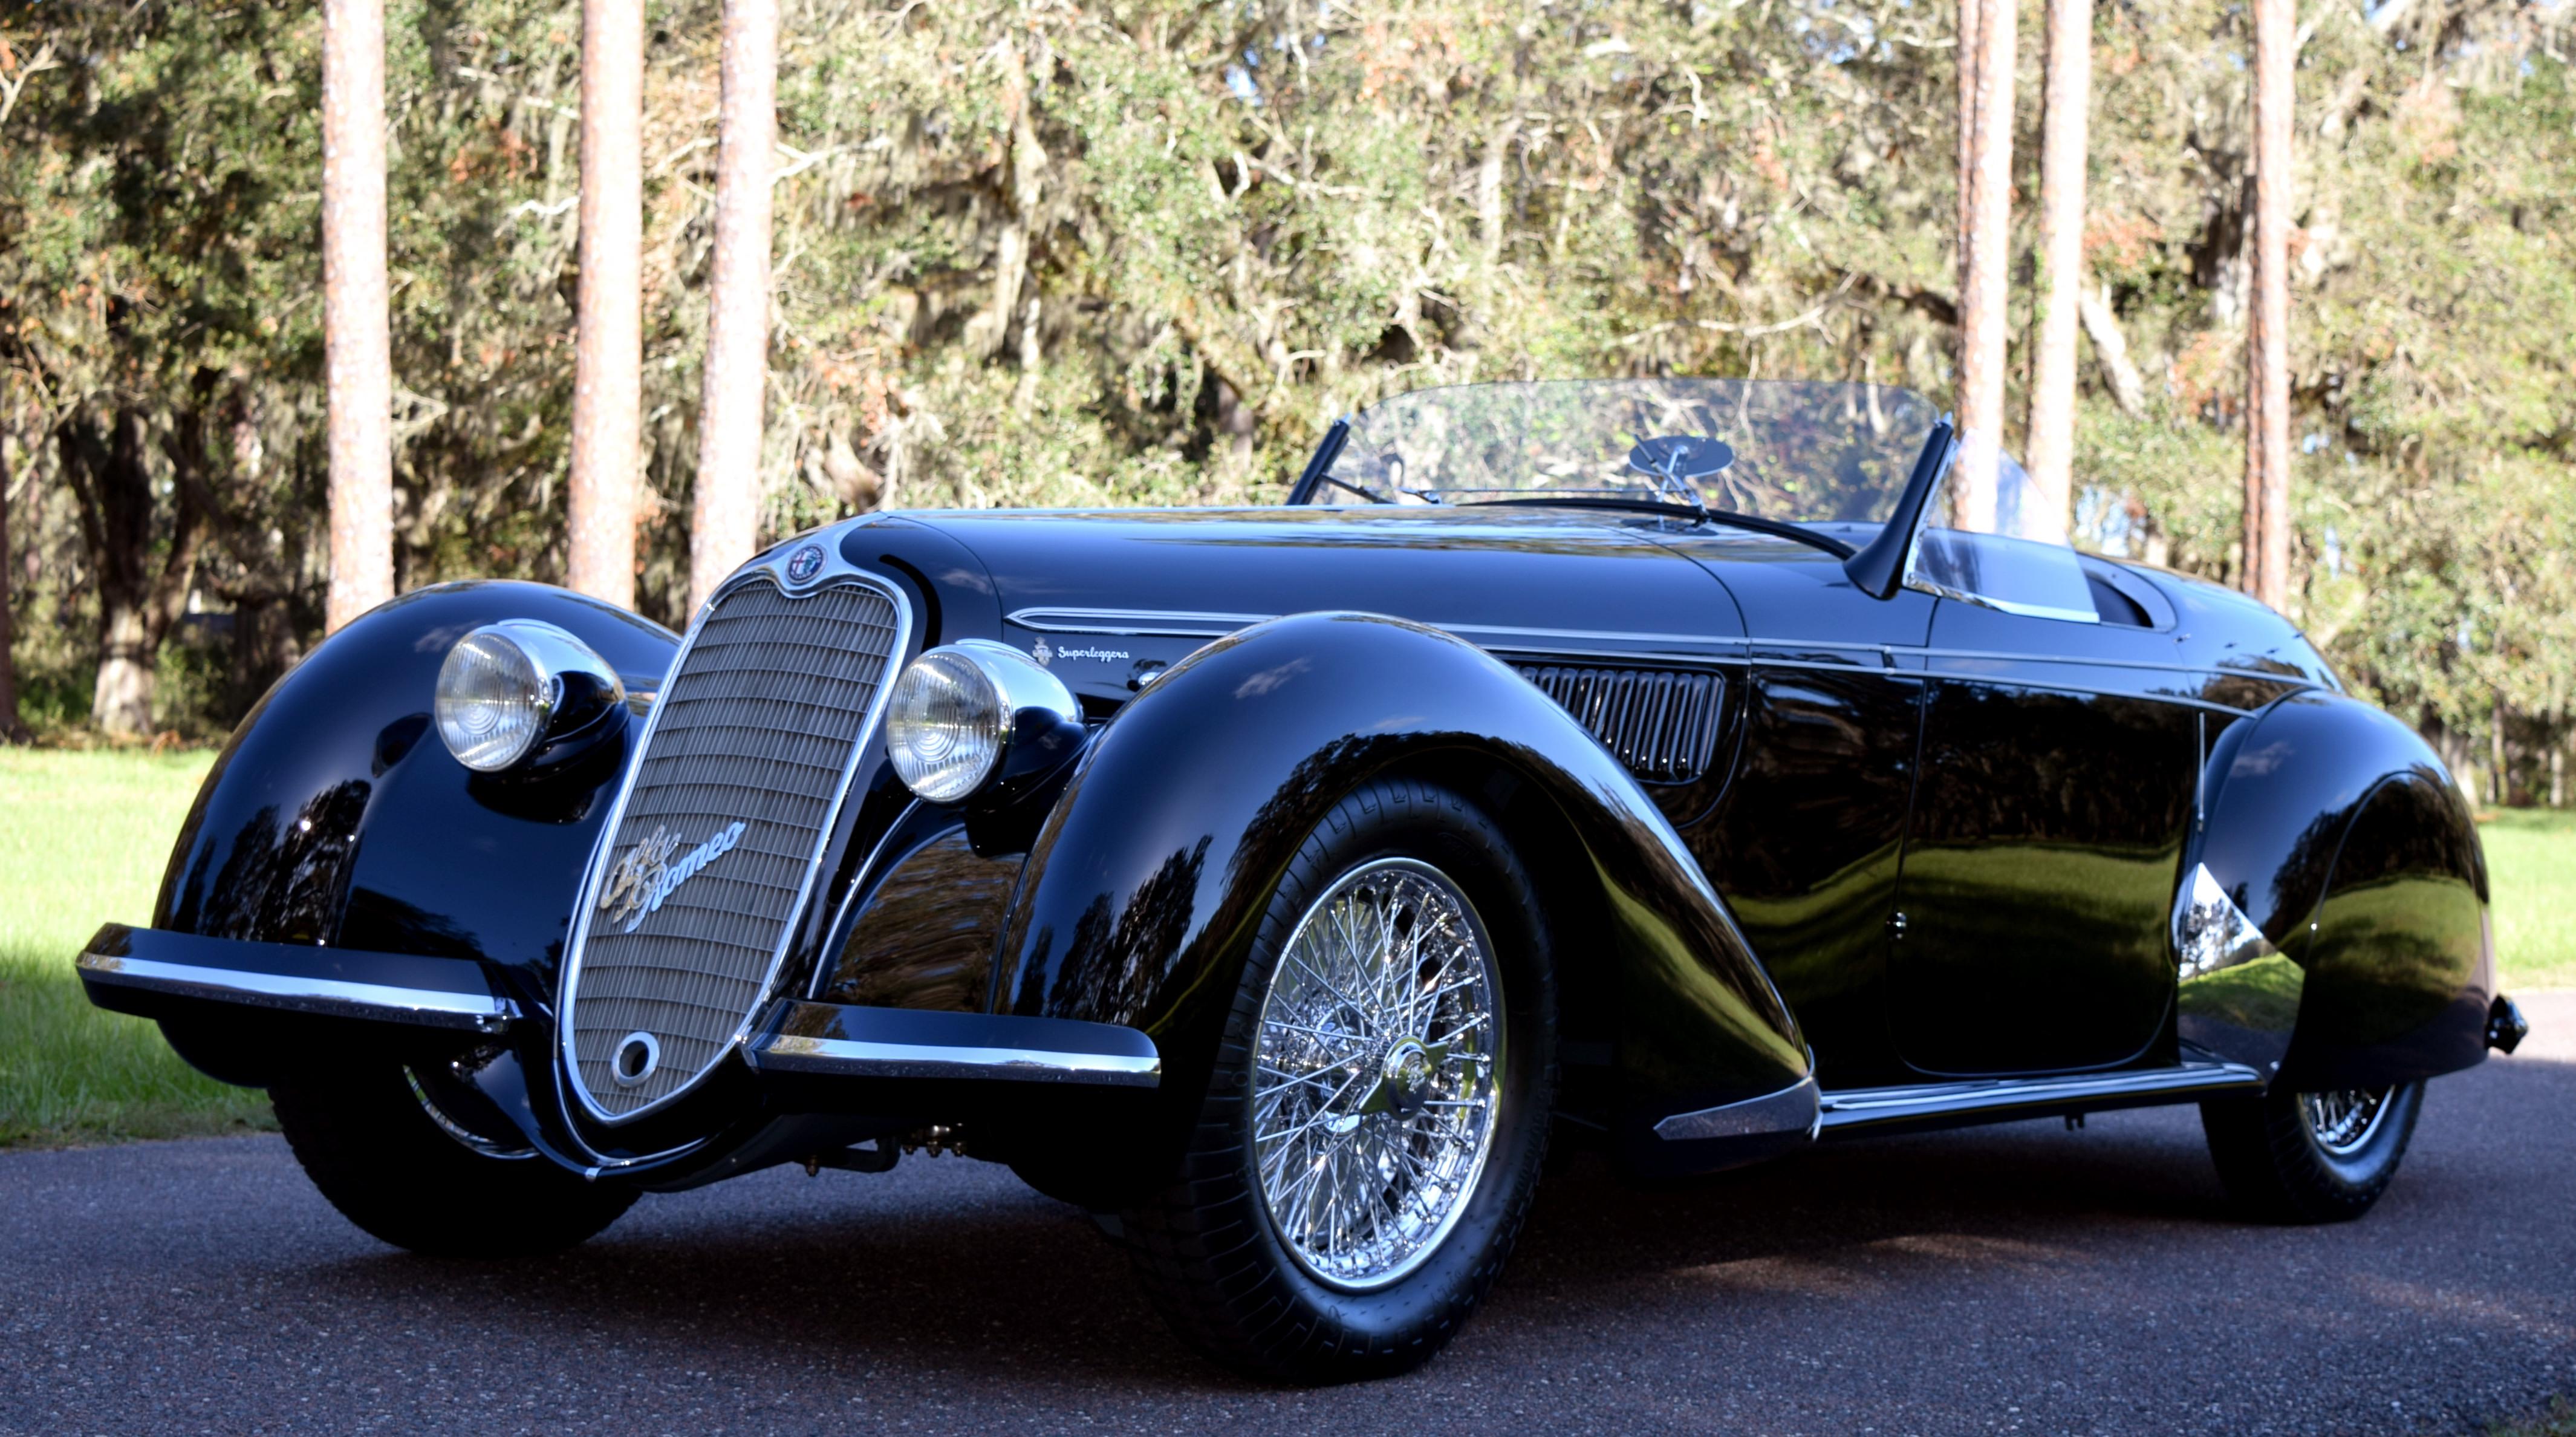 1939 Alfa Romeo 8C 2900B Spider by Touring: Amelia Island Concours de Sport